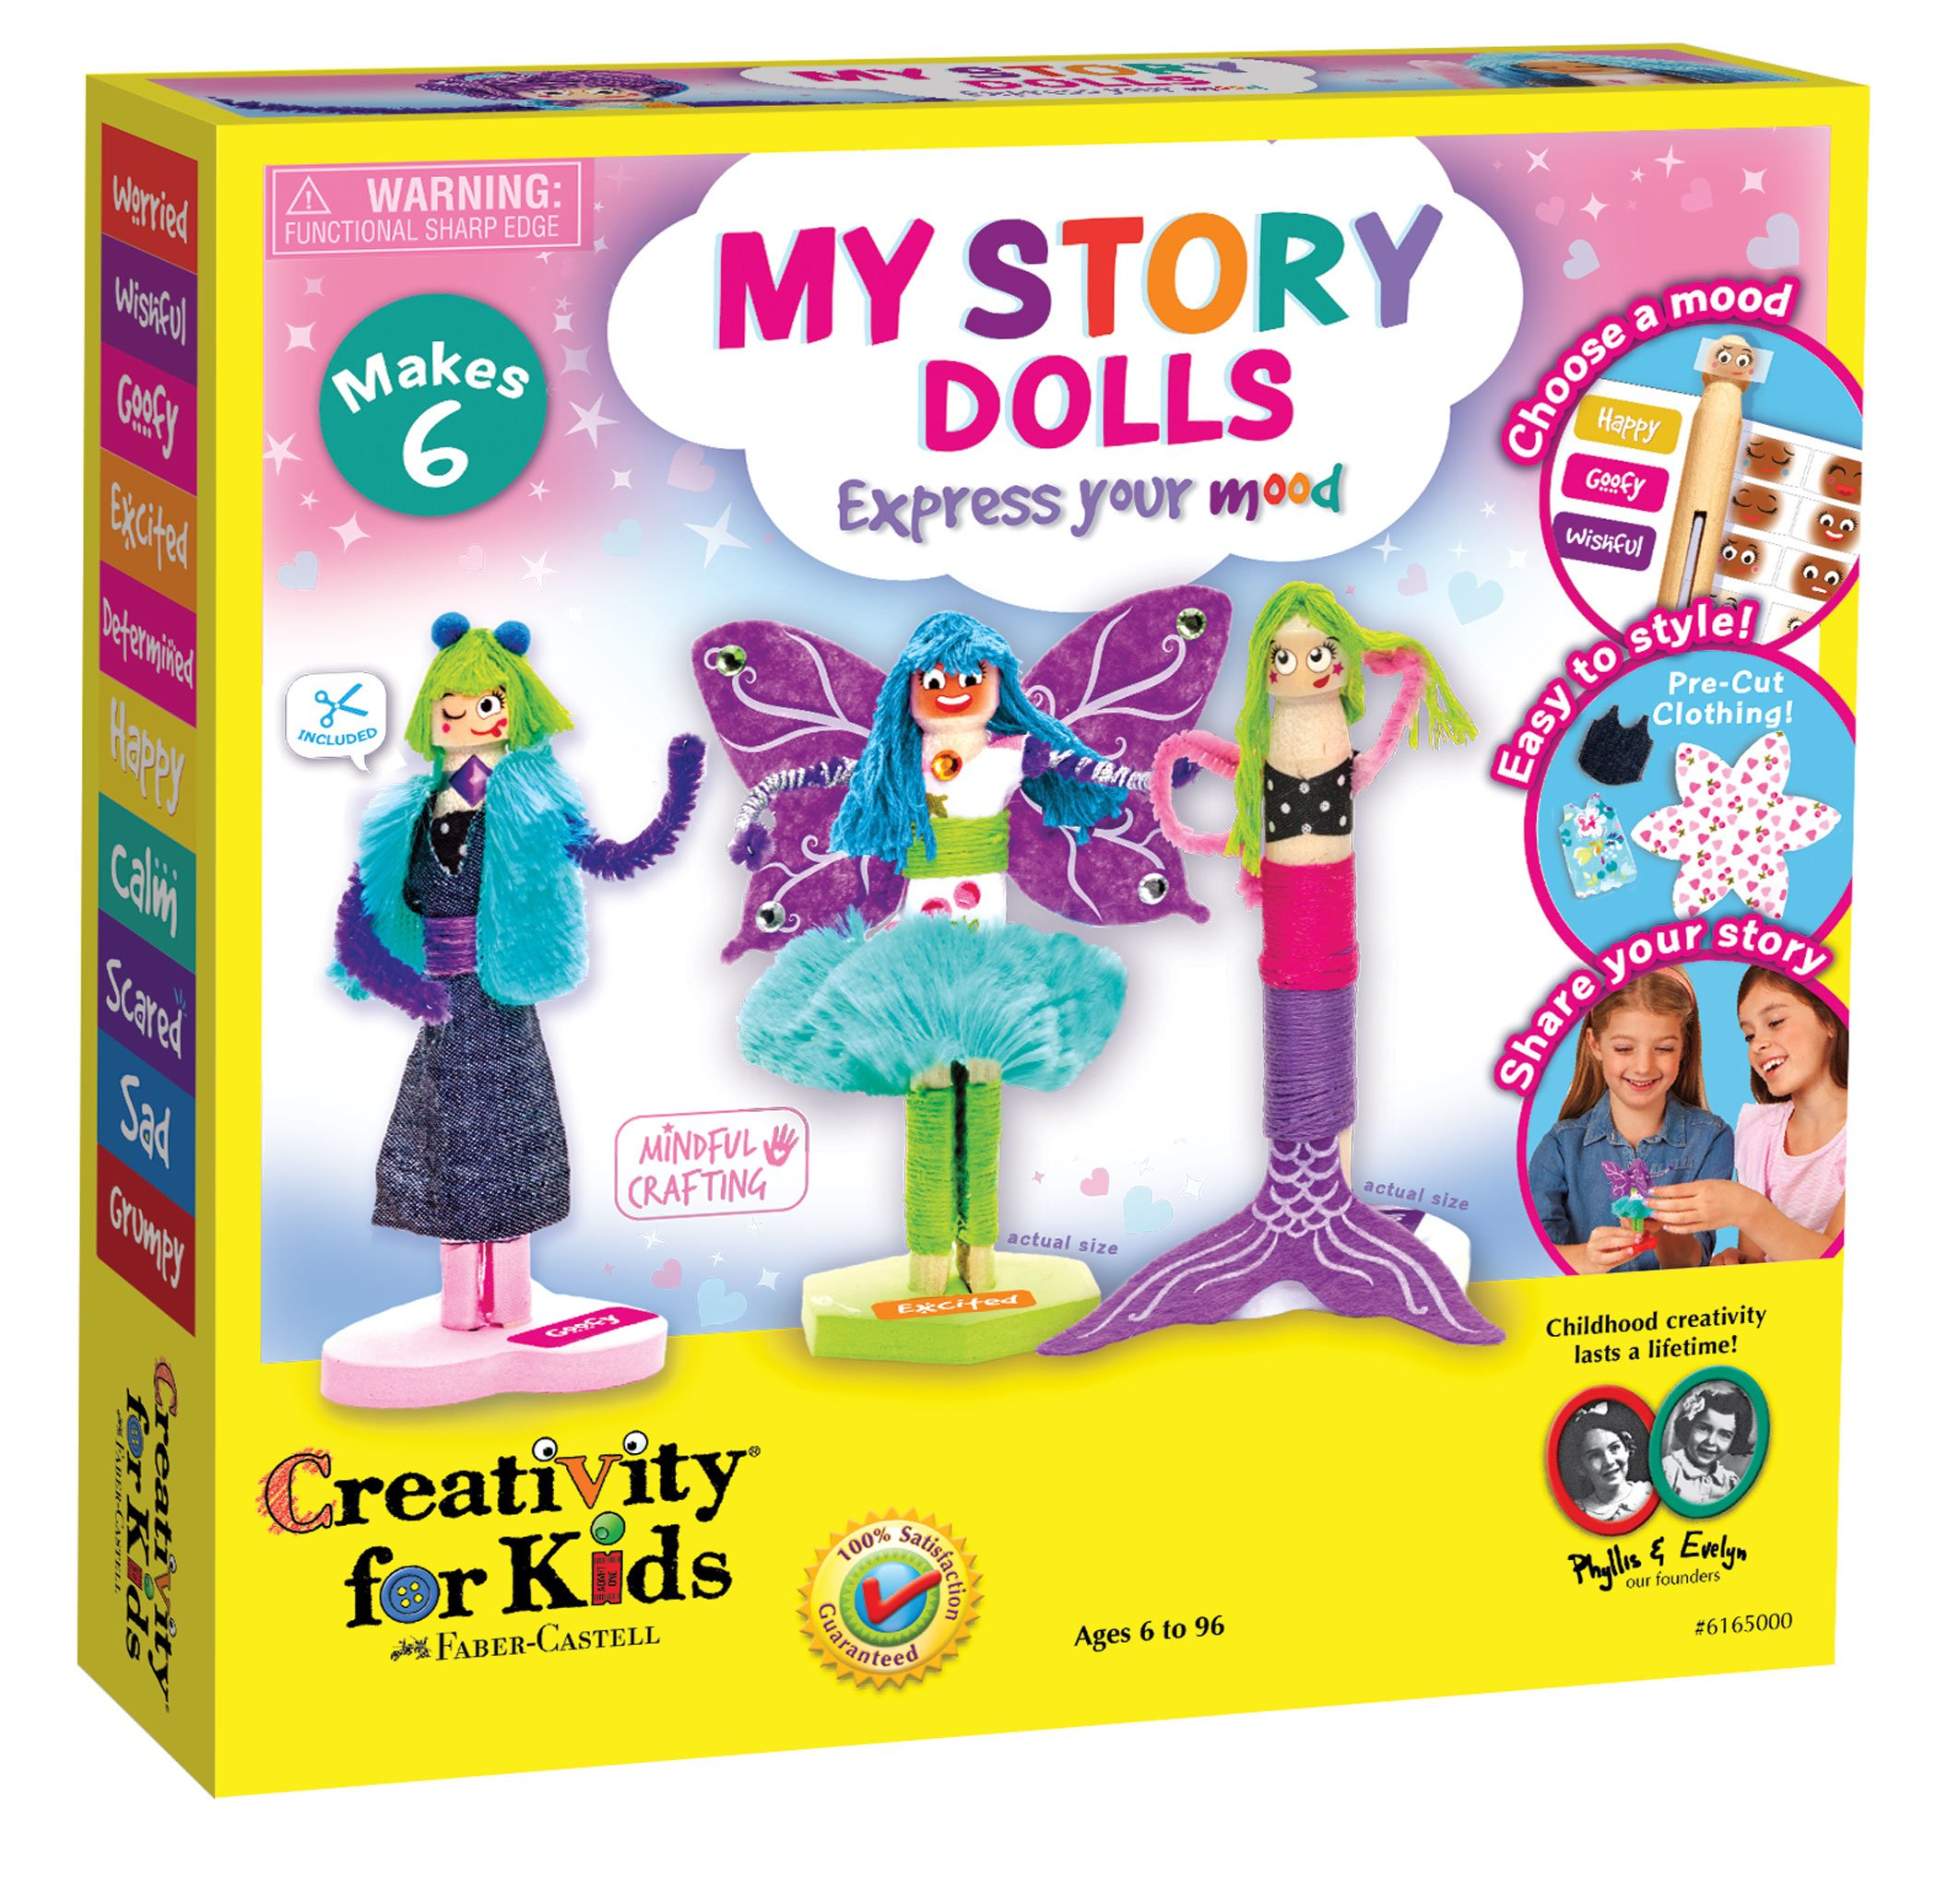 Creativity for Kids My Story Dolls - Create 6 Wooden Clothespin Dolls by Creativity for Kids